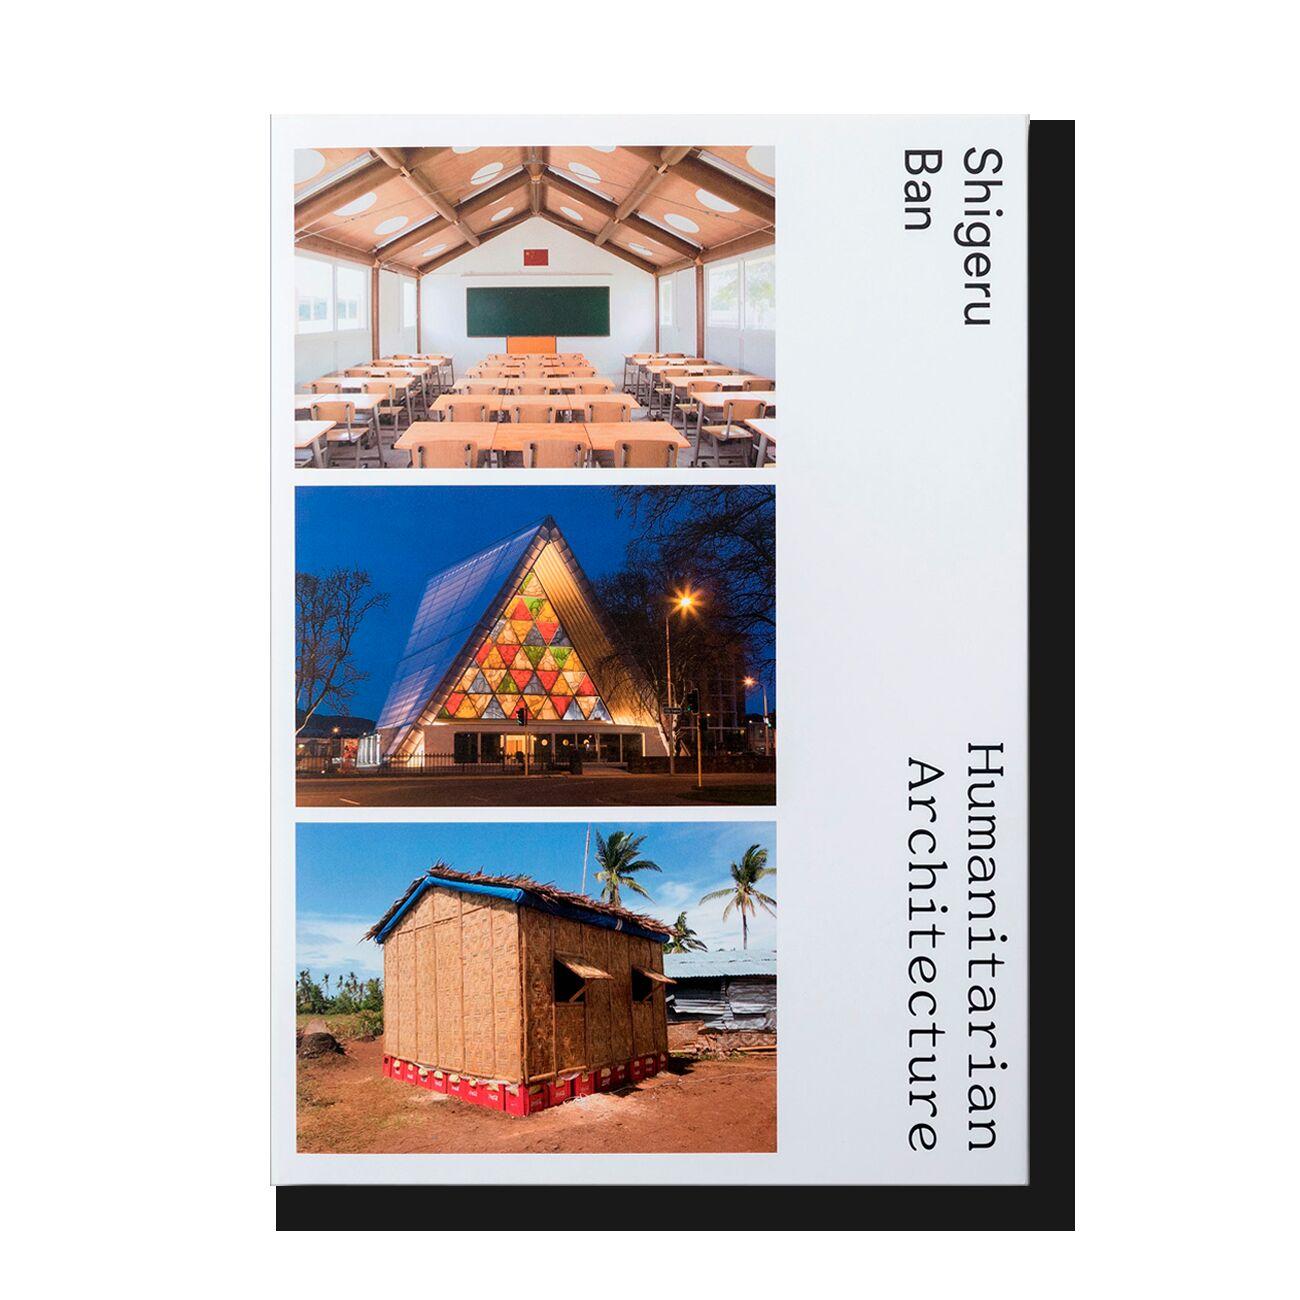 Shigeru Ban: Humanitarian Architecture